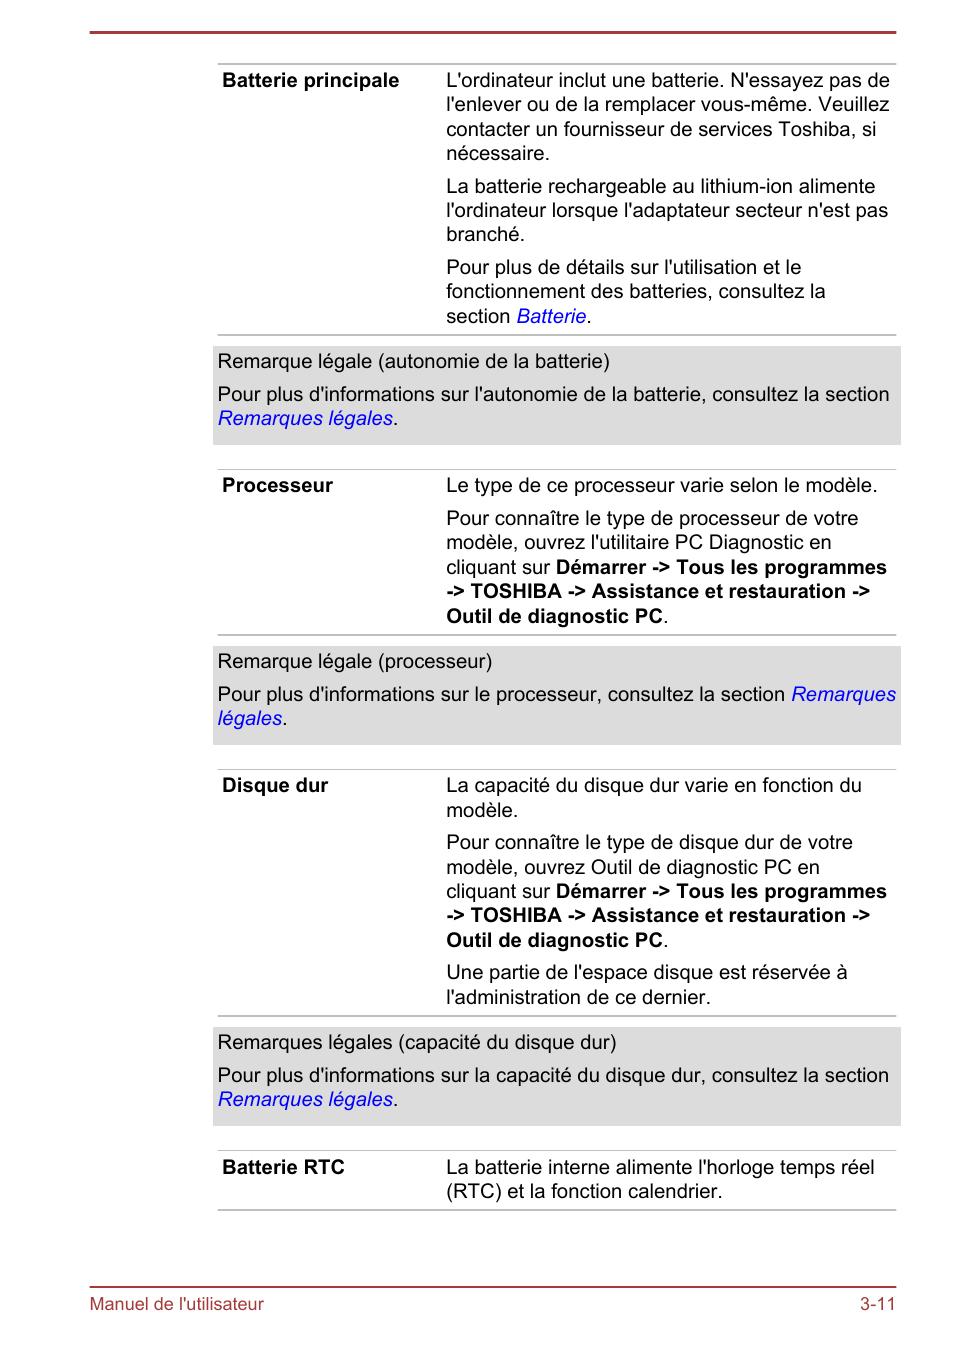 leather cv portfolio cto resume doc fbi resume builder